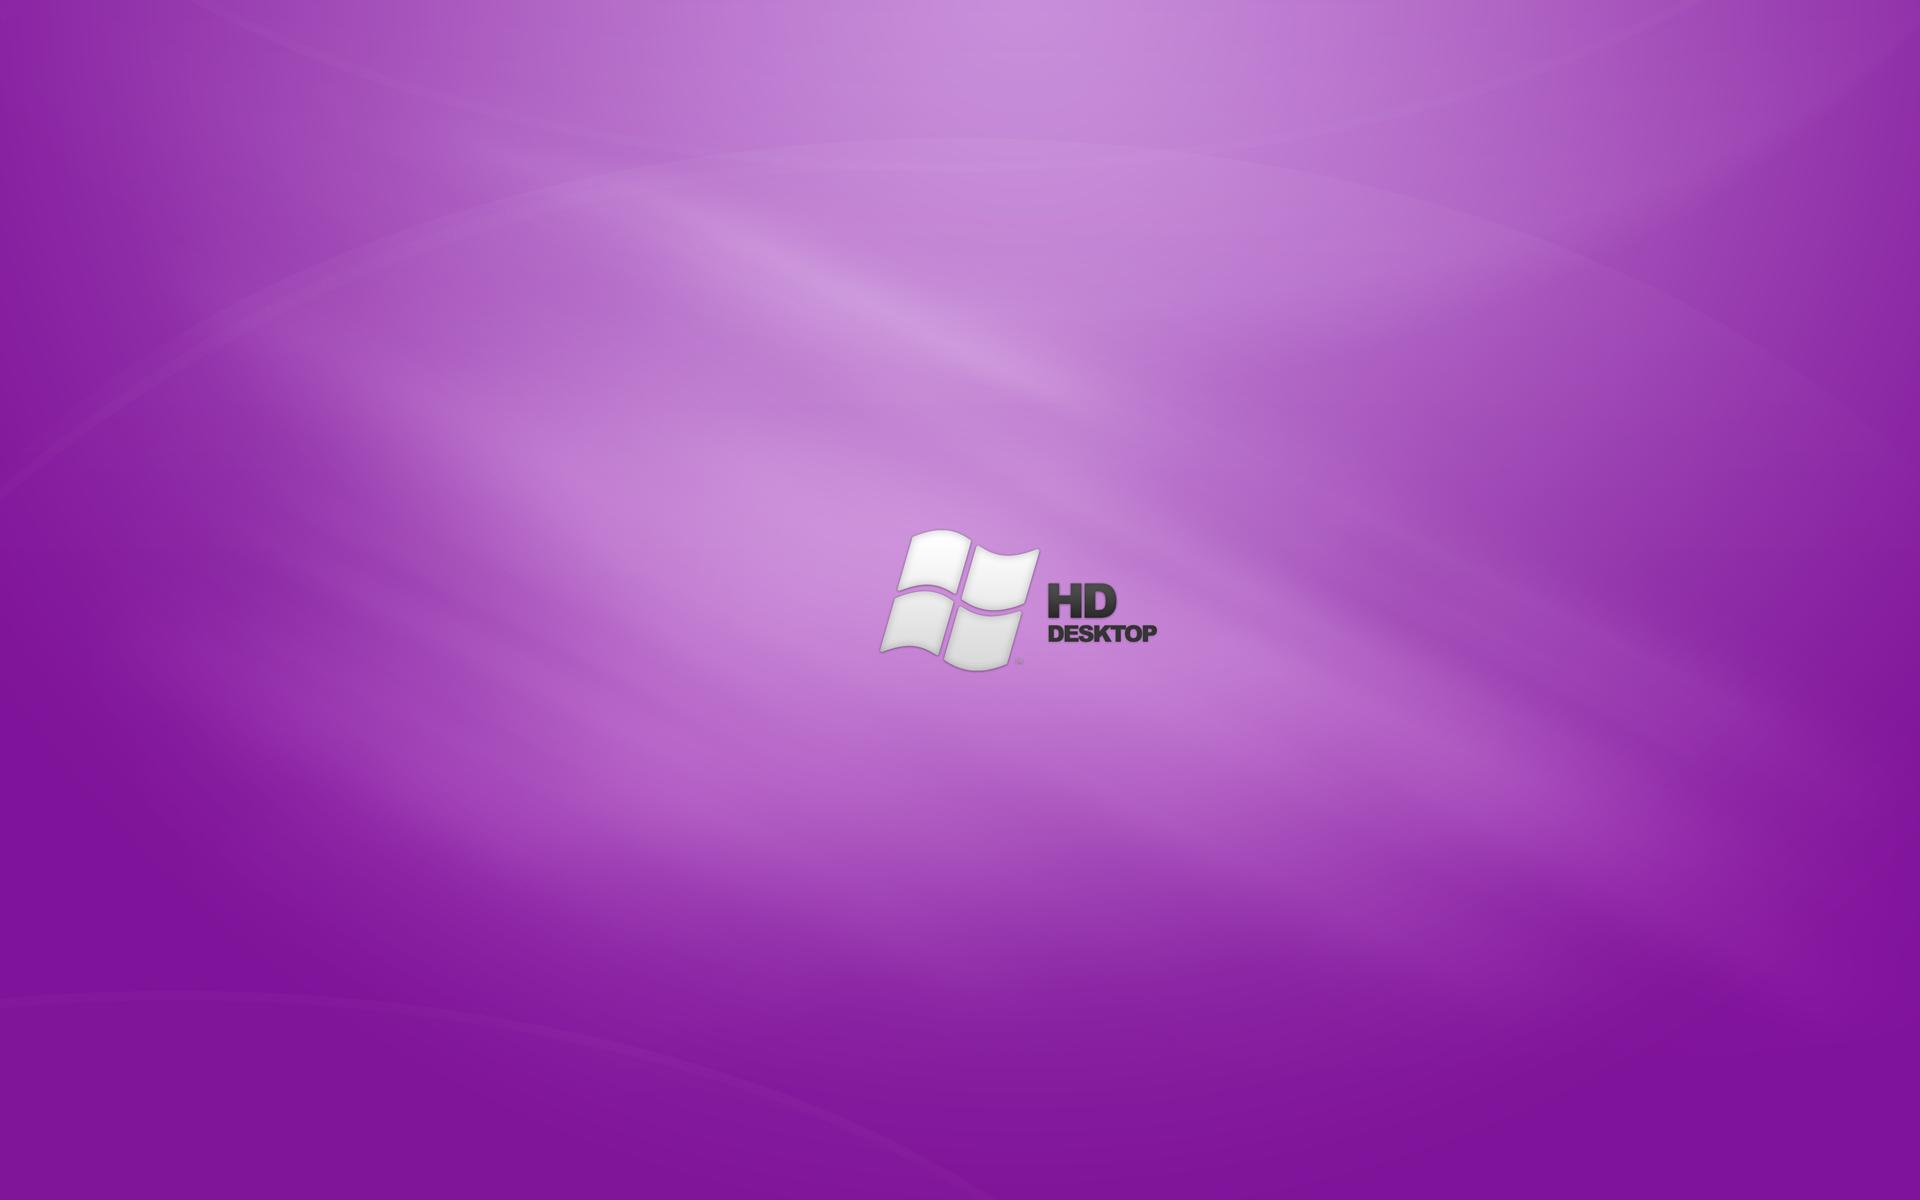 Desktop Windows 10   hd wallpapers desktop backgrounds windows 10 1920x1200